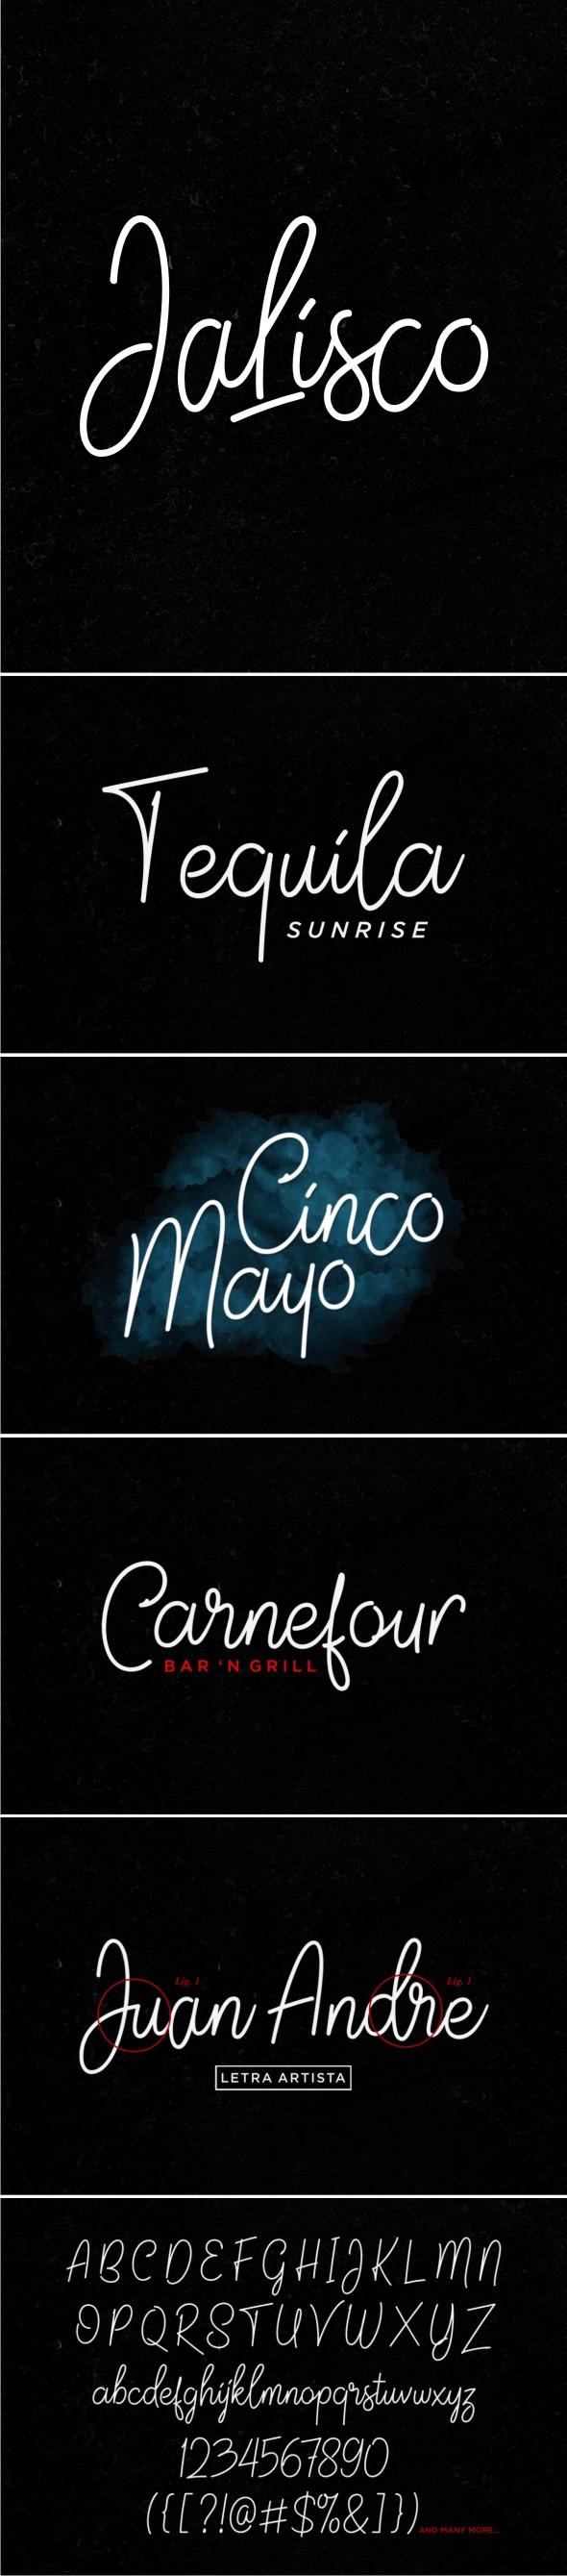 Jalisco Script - Hand-writing Script